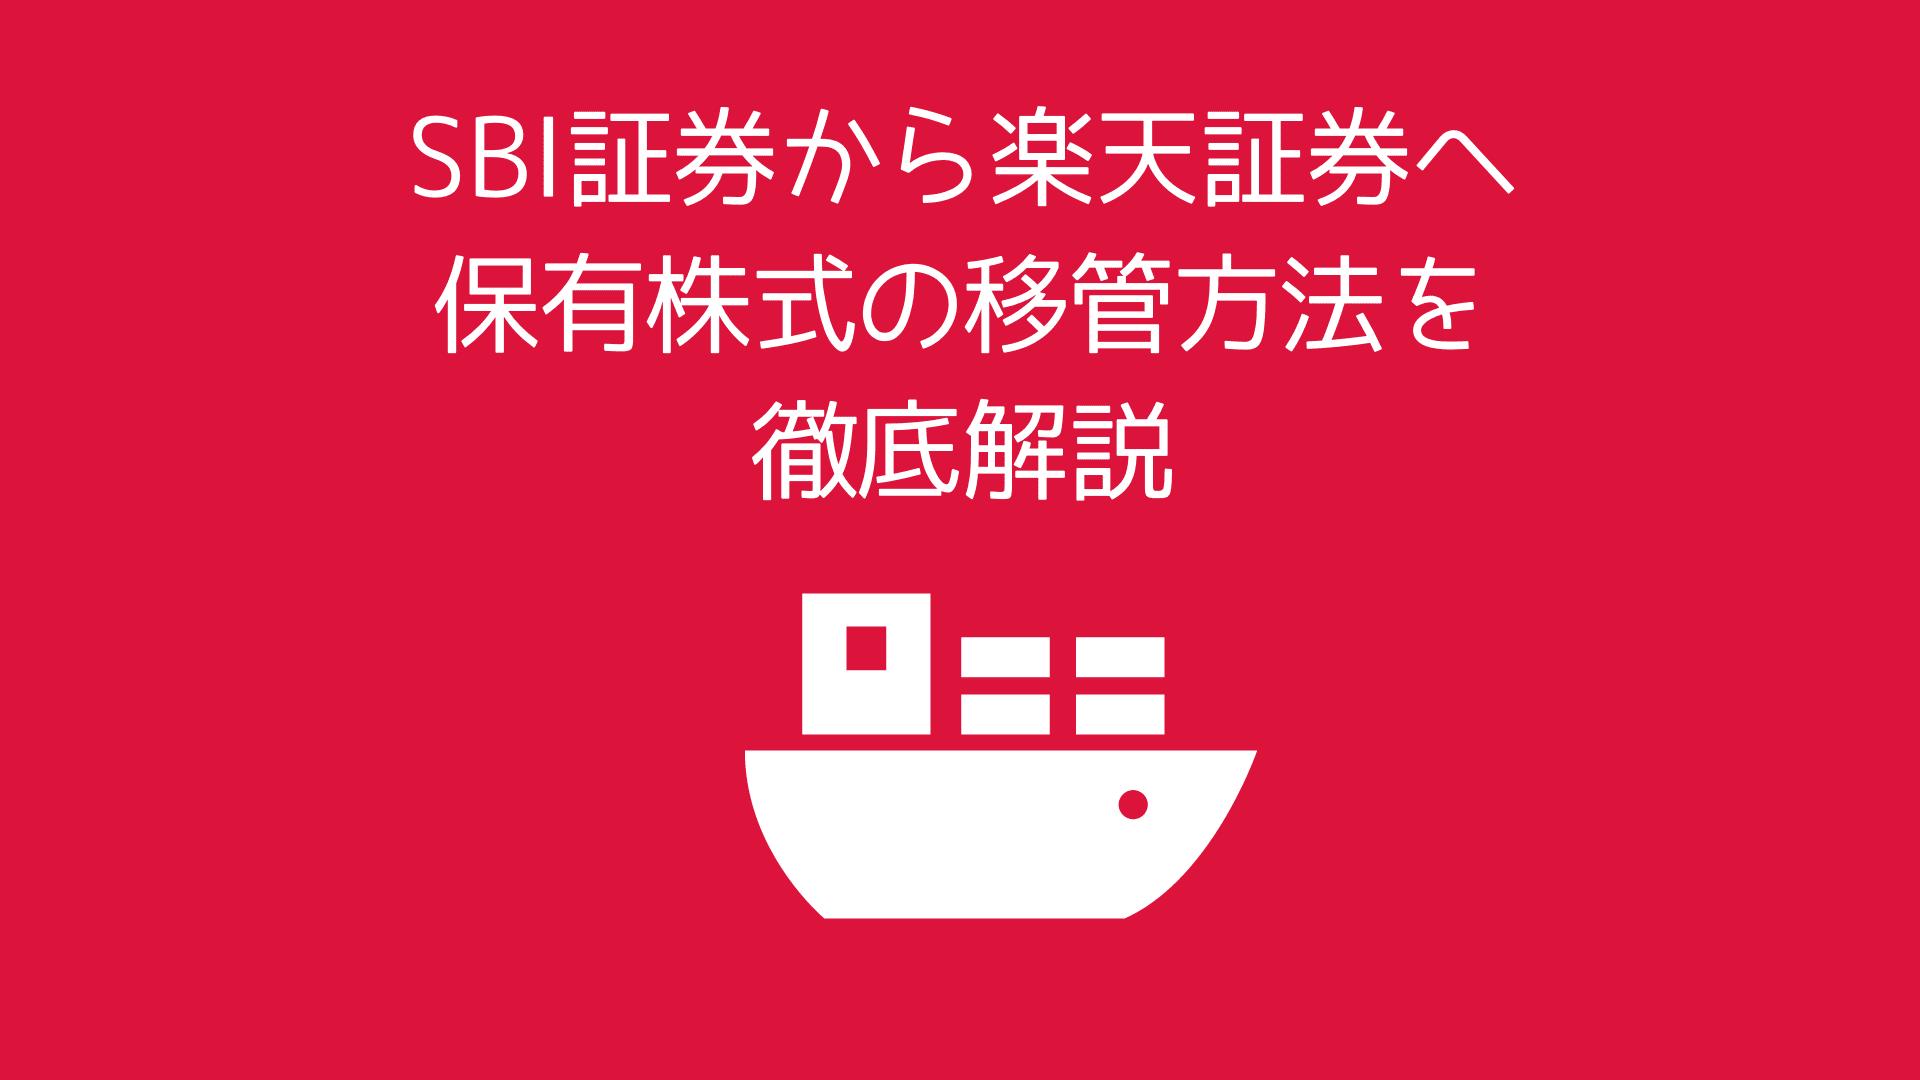 SBI証券から楽天証券へ保有株式の移管方法を徹底解説